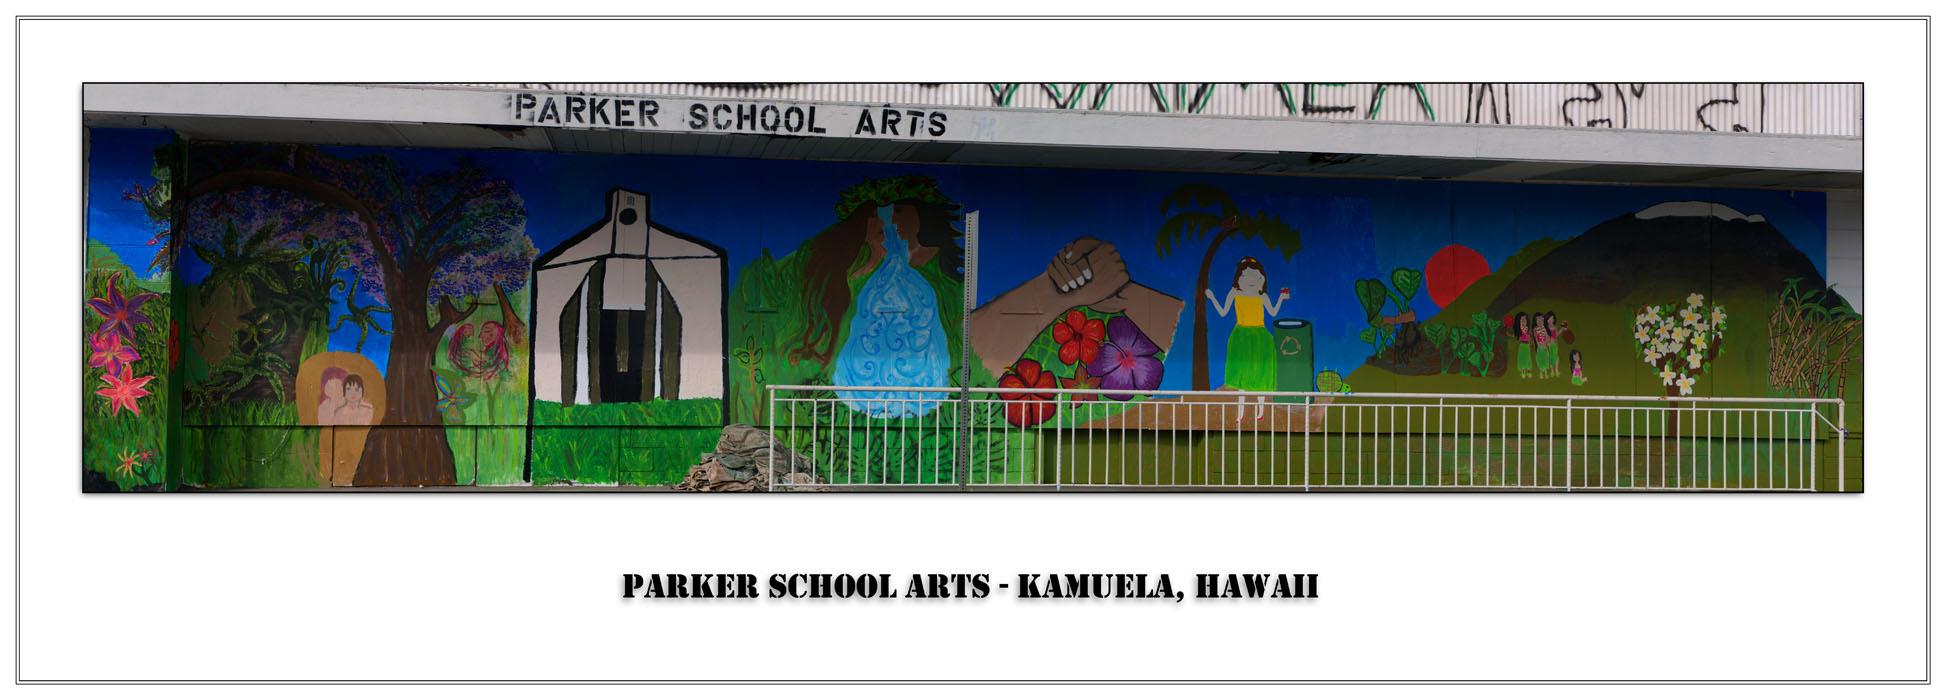 parker school arts